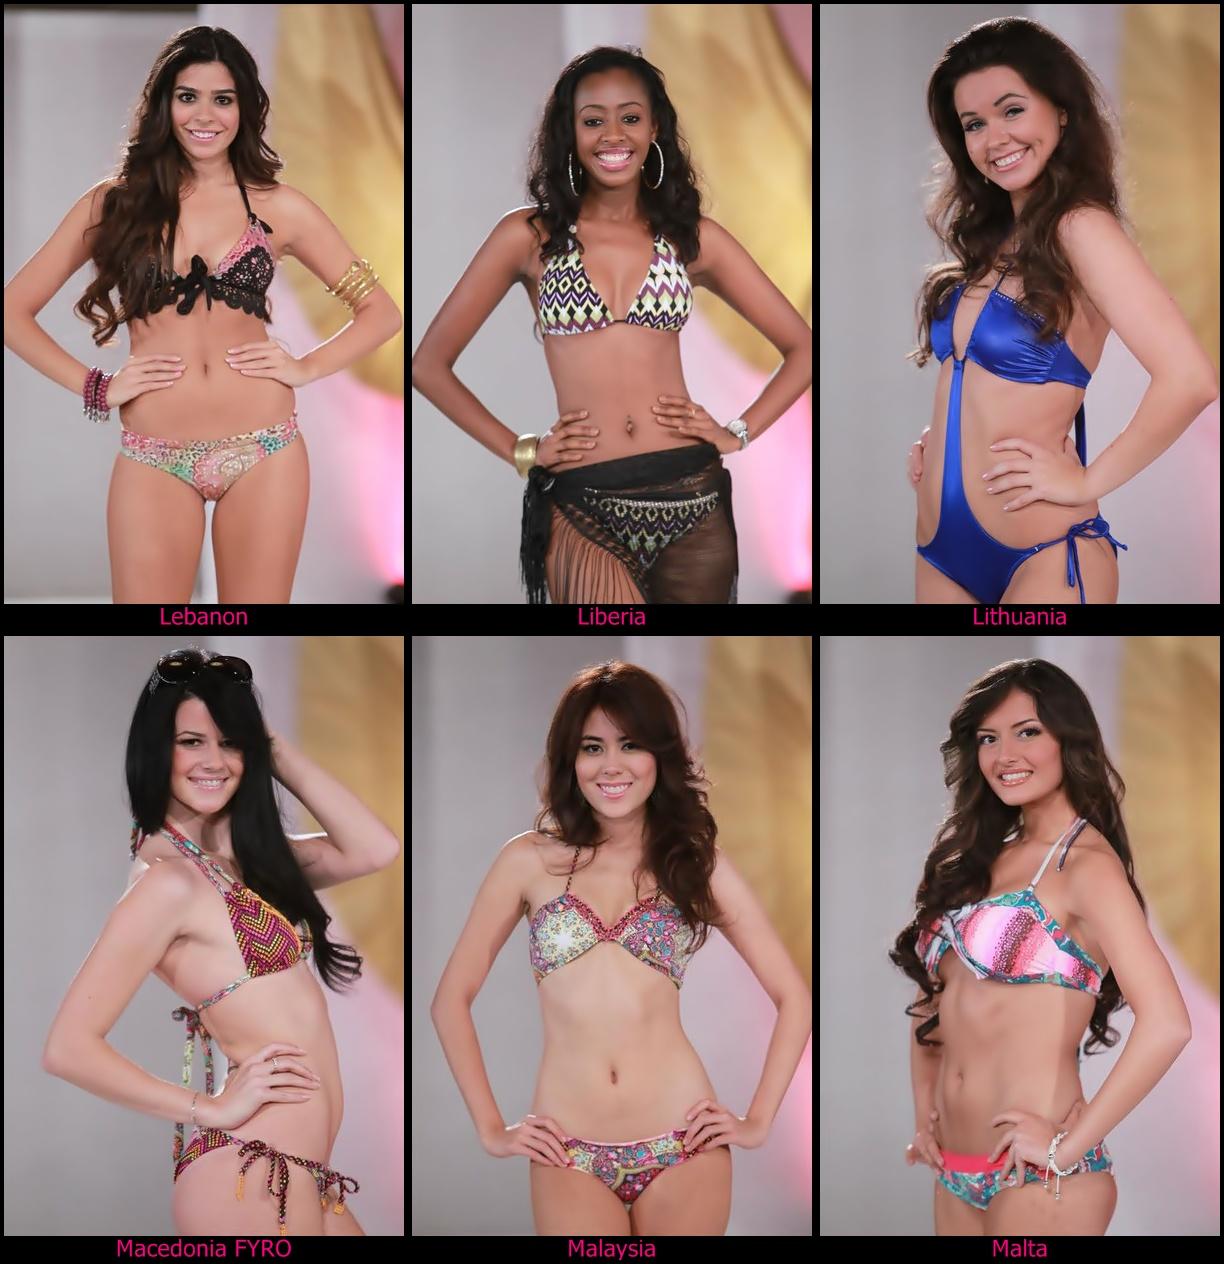 Concursos de Beleza: Candidatas a Miss World 2011 em Beach Beauty